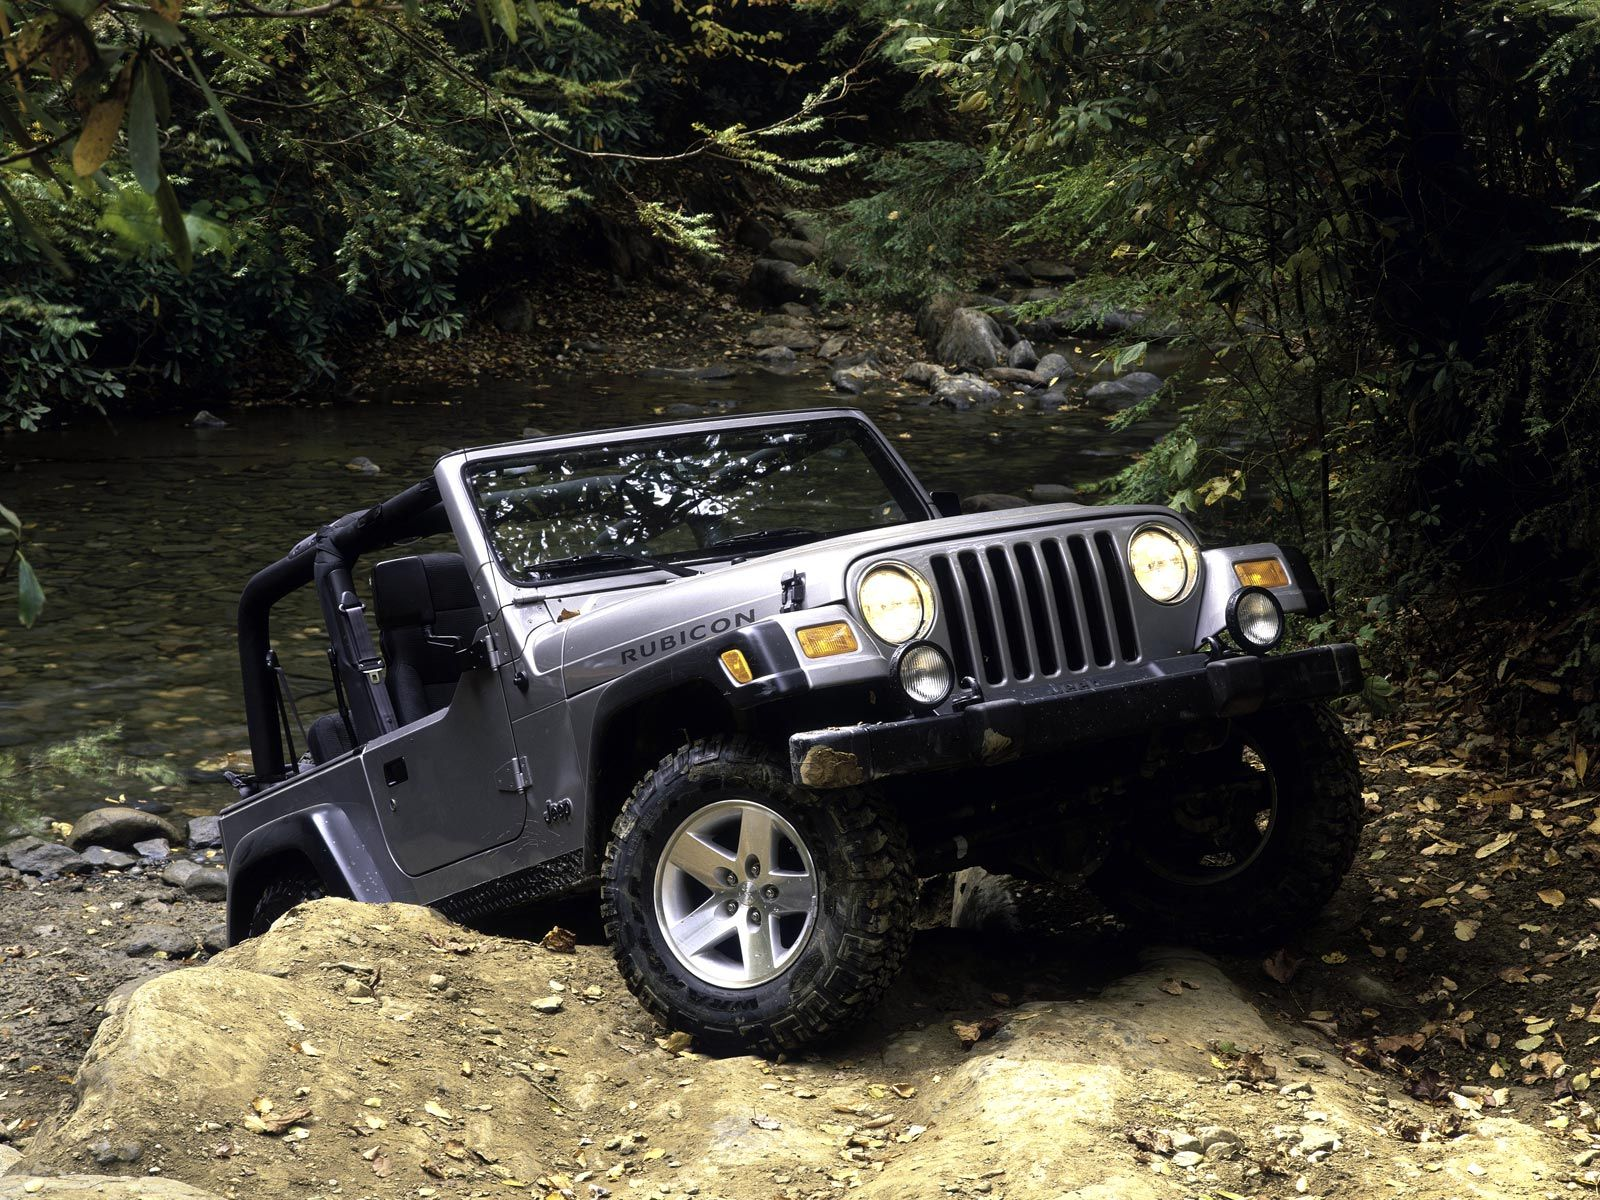 Jeep Wrangler Wallpapers Wallpaper 1600 978 Jeep Wallpapers 49 Wallpapers Adorable Wallpapers Jeep Wrangler Jeep Wrangler Rubicon Jeep Wrangler Tires